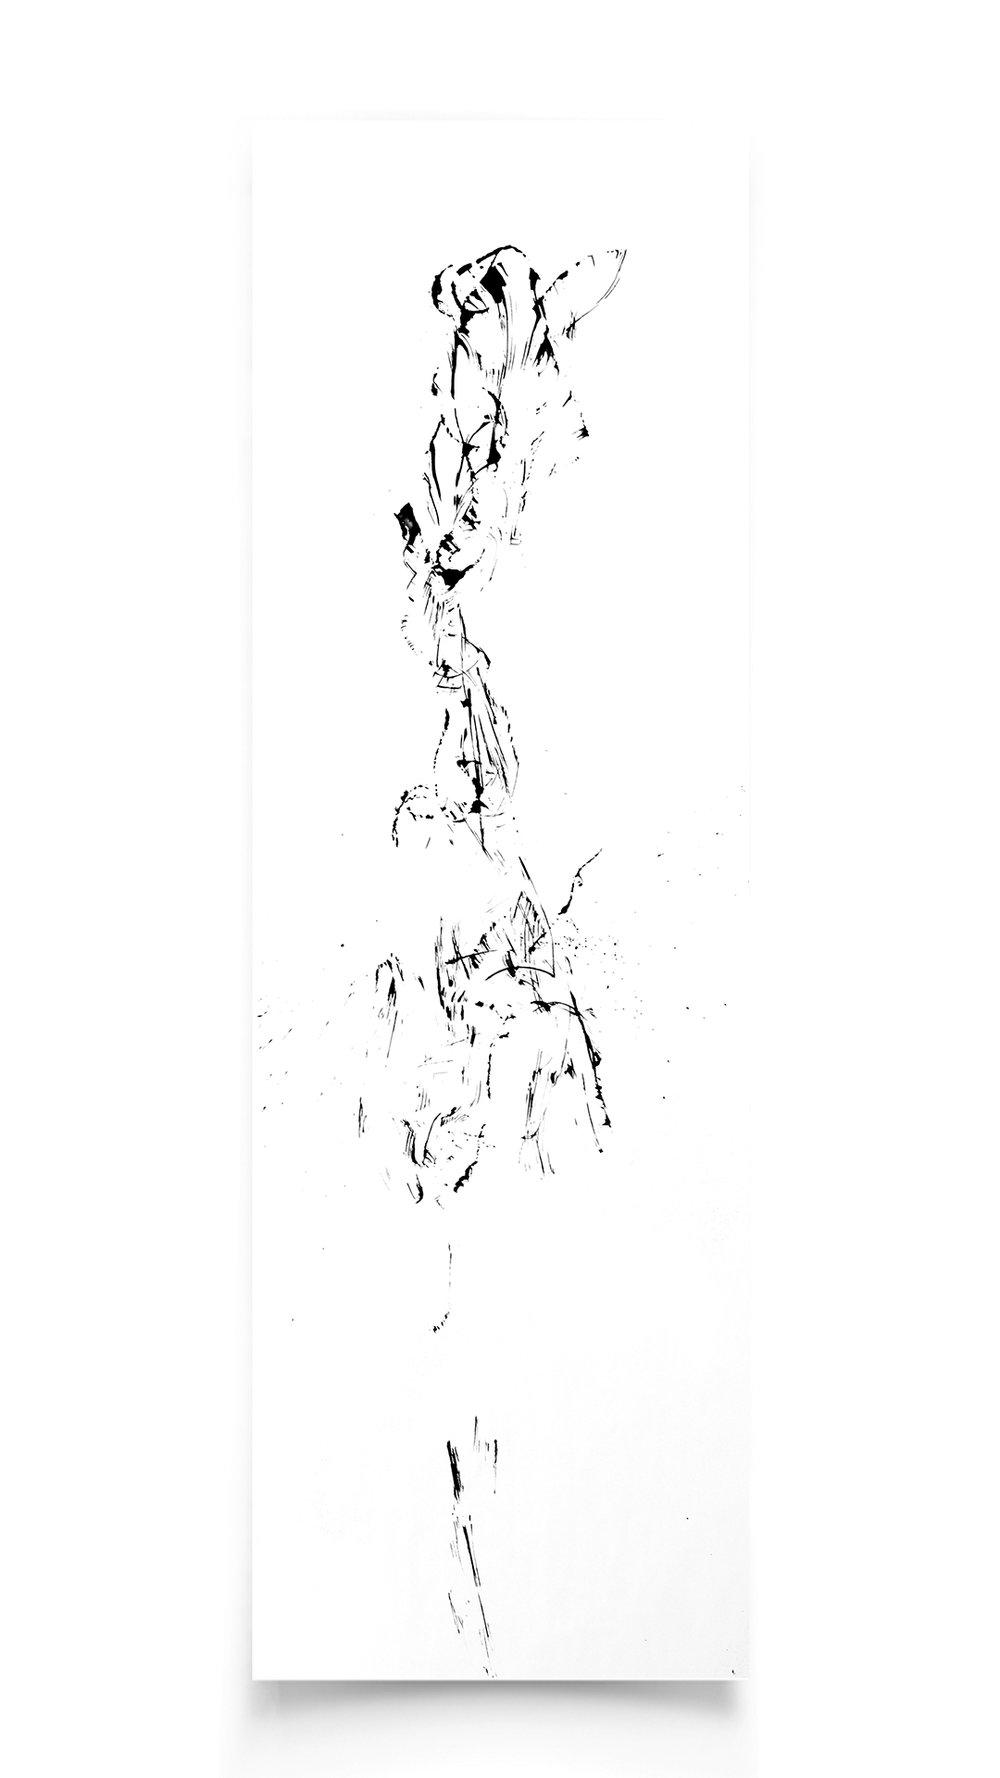 ProcessDrawings2Artboard 1 copy.jpg